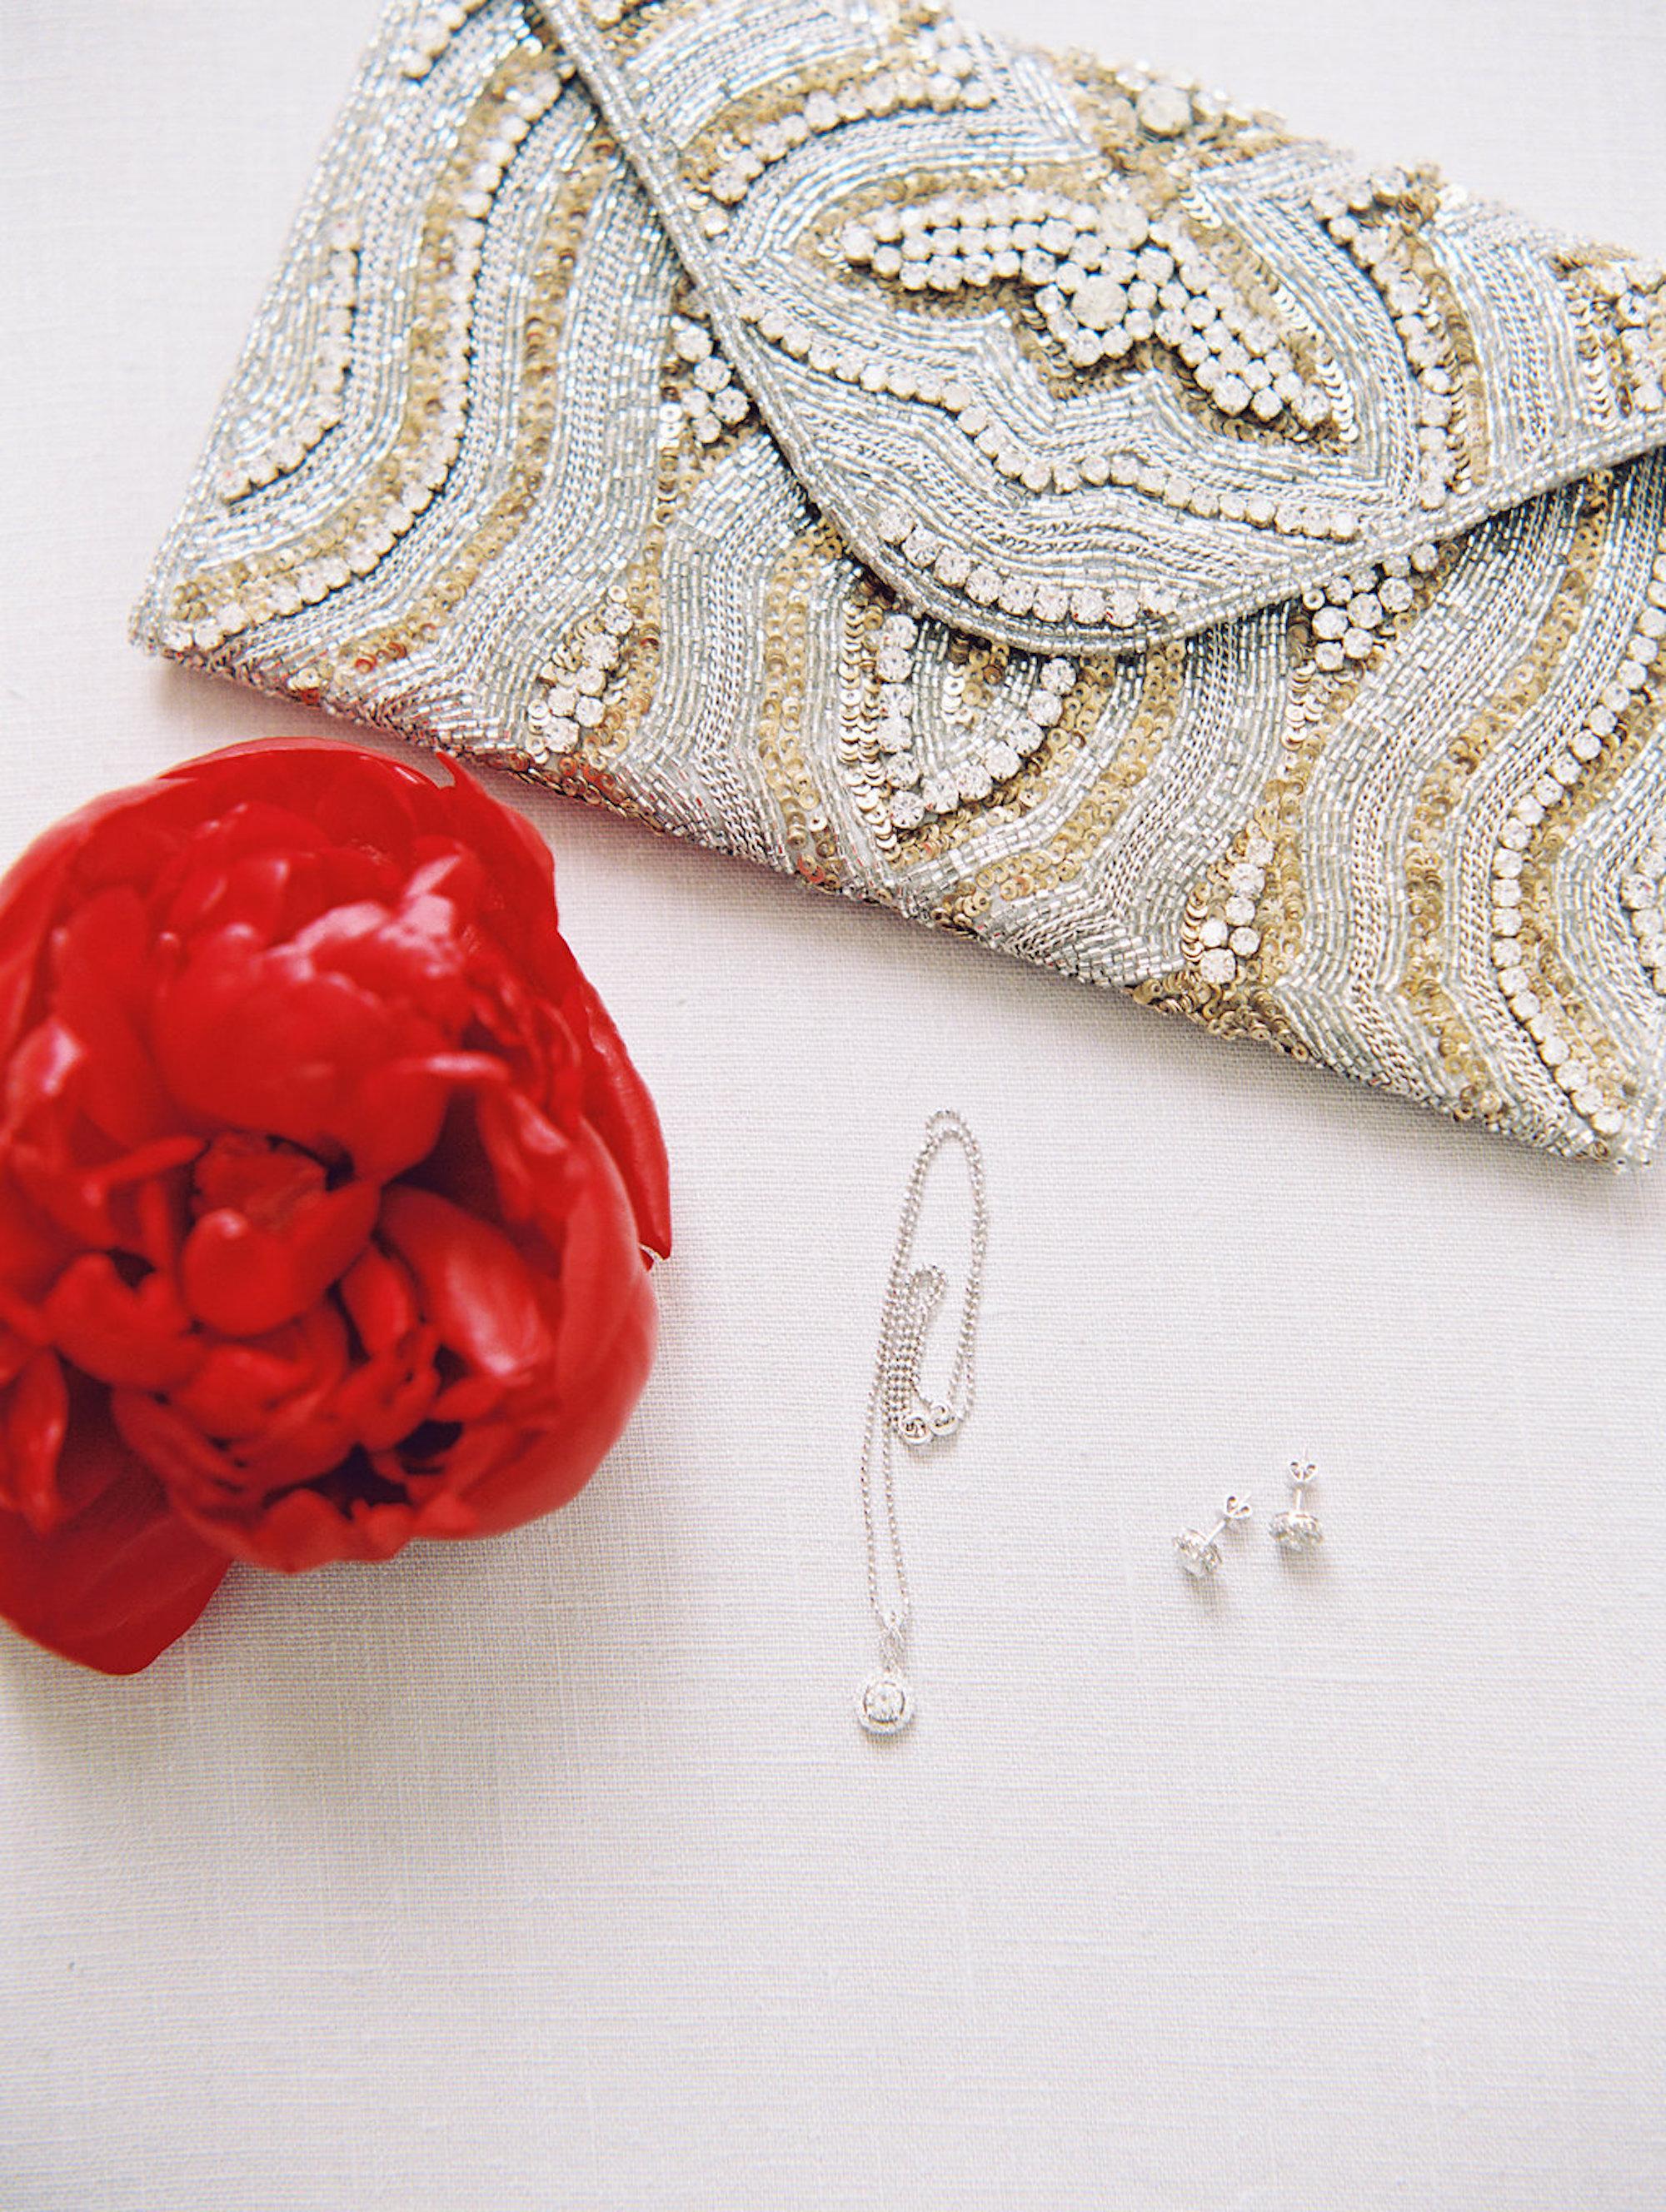 www.santabarbarawedding.com | Lavender & Twine | Michele B. Events | Santa Barbara Courthouse | Bridal Accessories